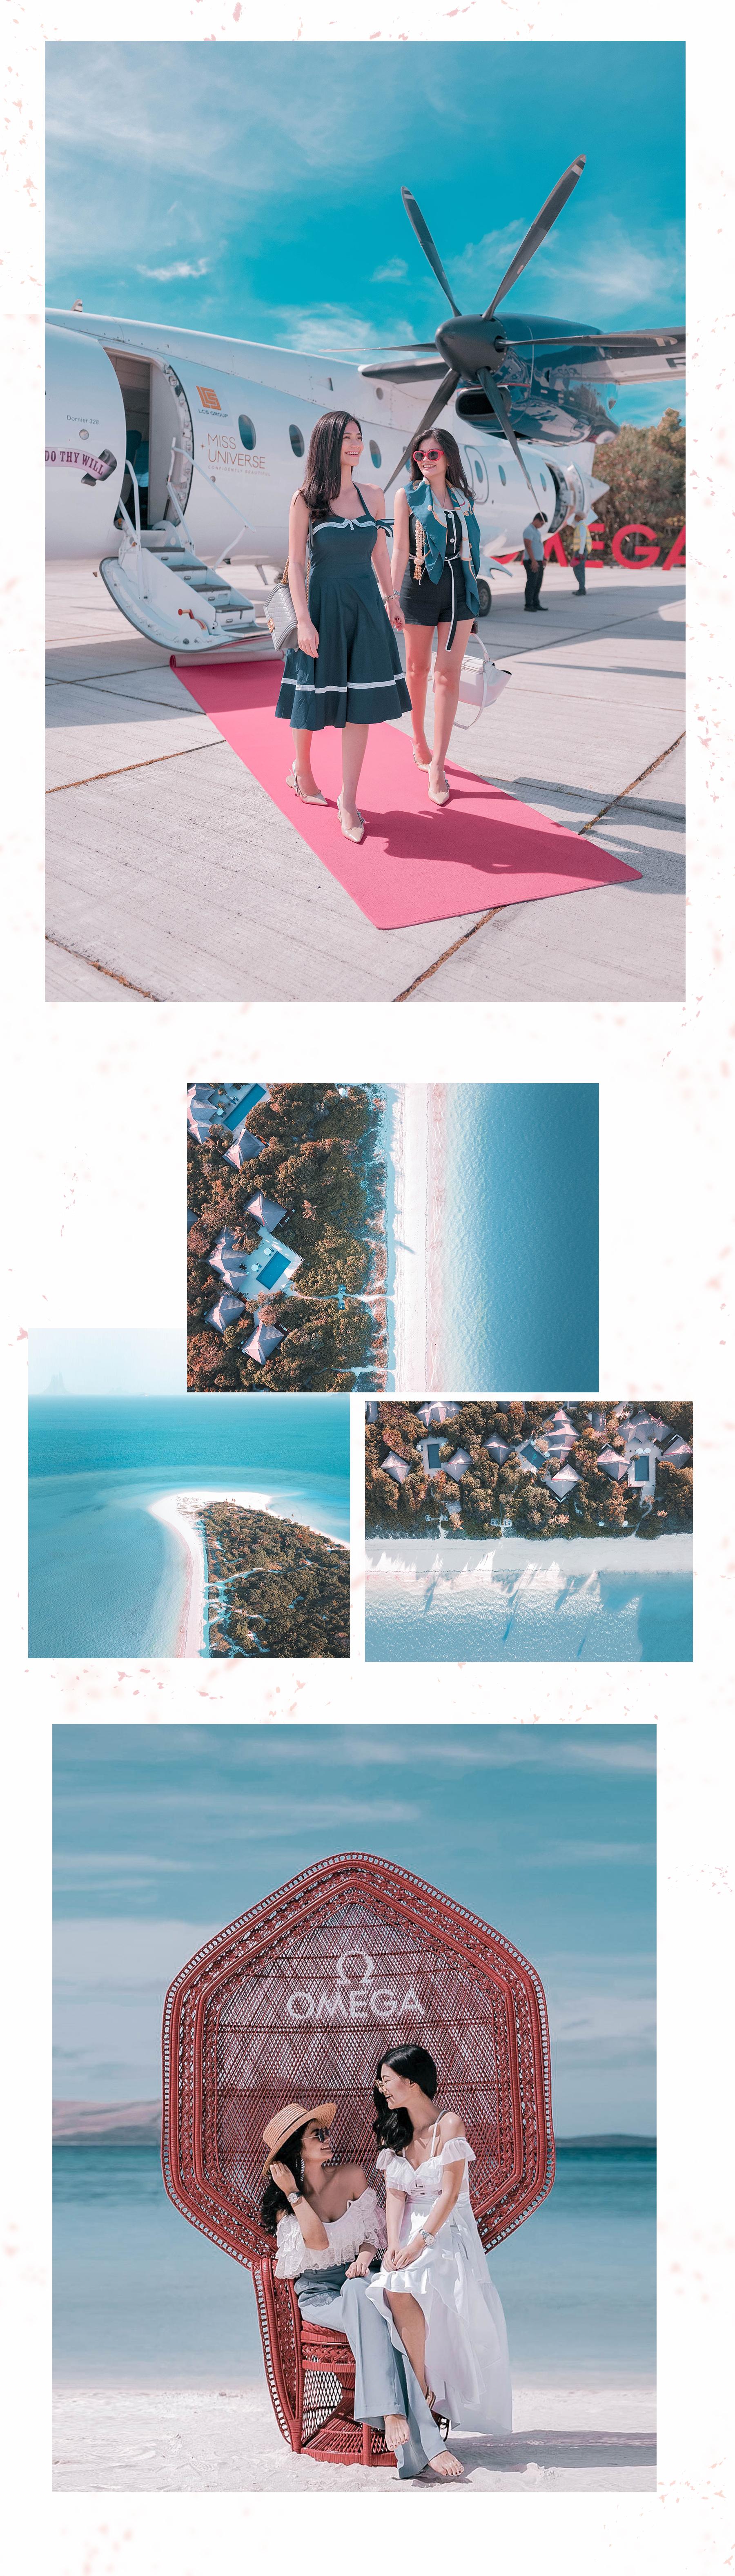 VV Amanpulo Beach 2